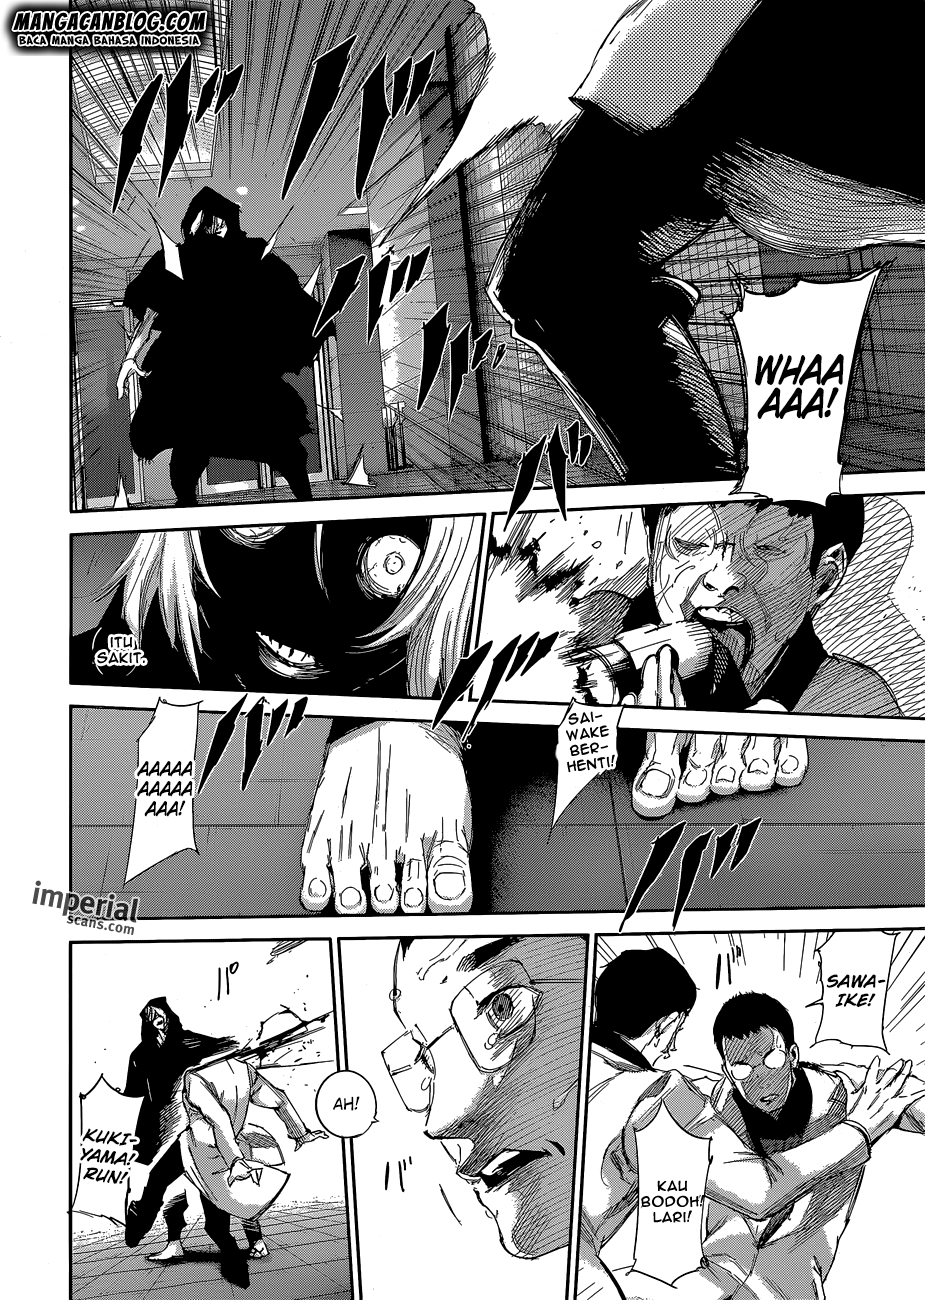 Komik tokyo ghoul re 022 - chapter 22 23 Indonesia tokyo ghoul re 022 - chapter 22 Terbaru 5|Baca Manga Komik Indonesia